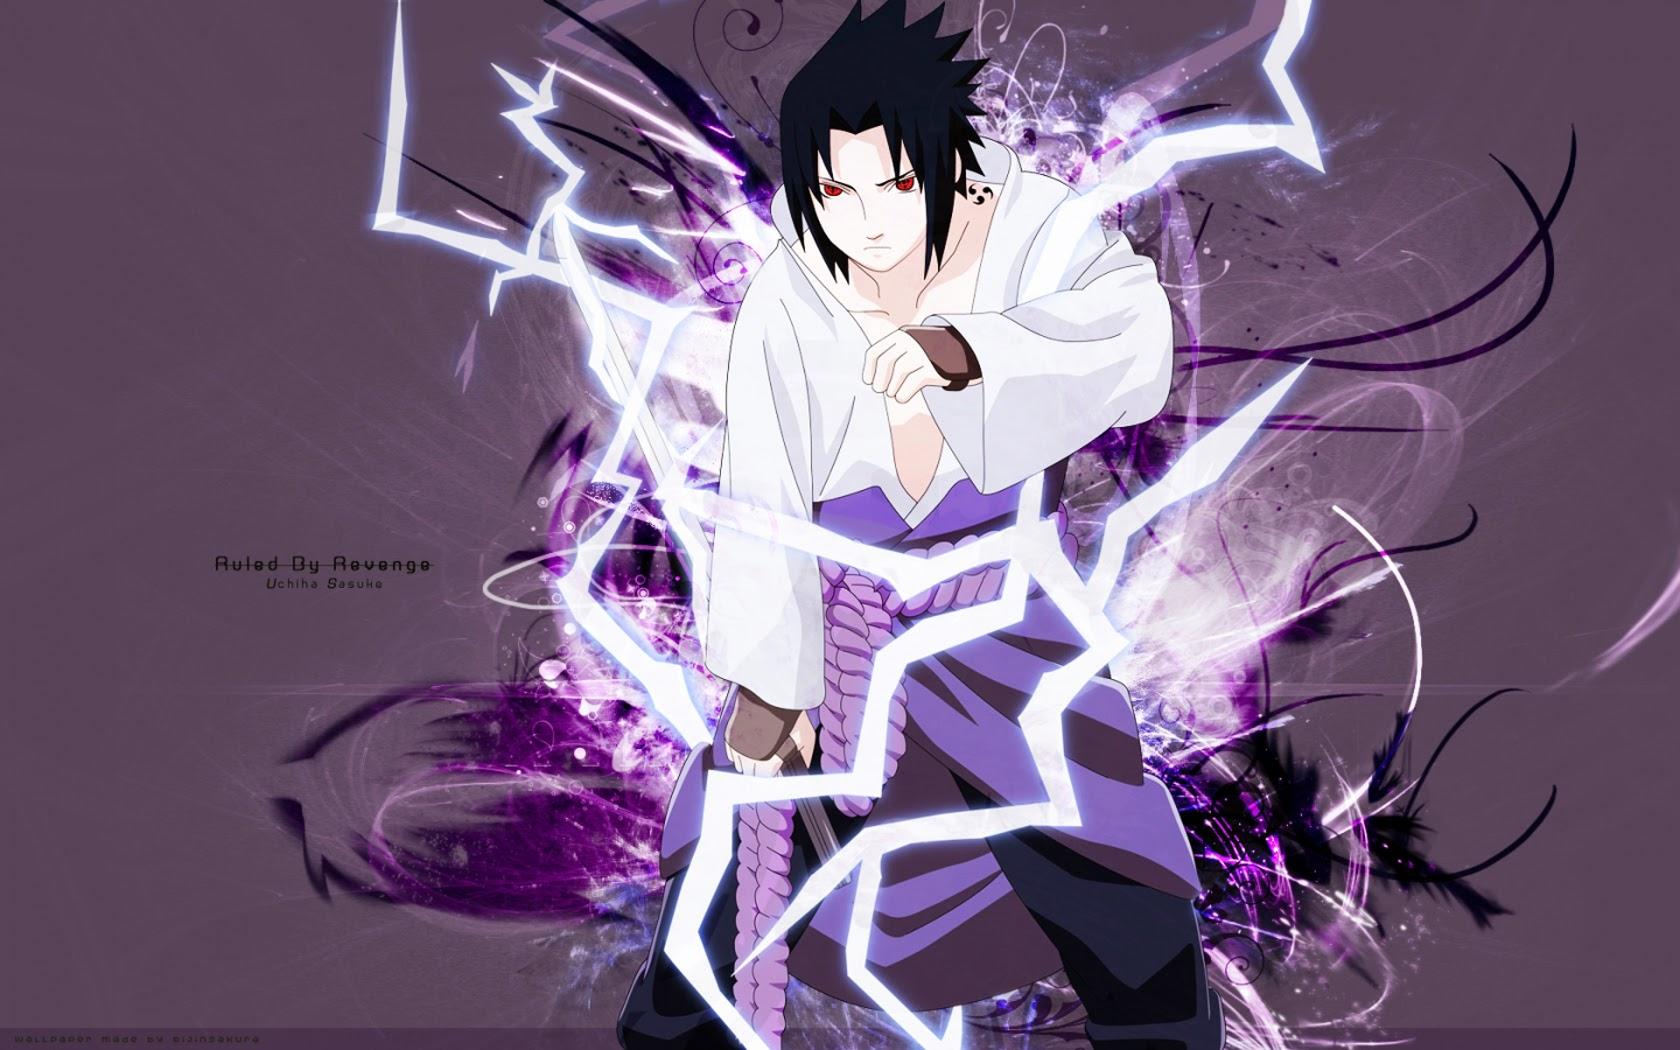 sasuke uchiha sharingan lightning edge hd wallpaper anime 1680x1050 1680x1050